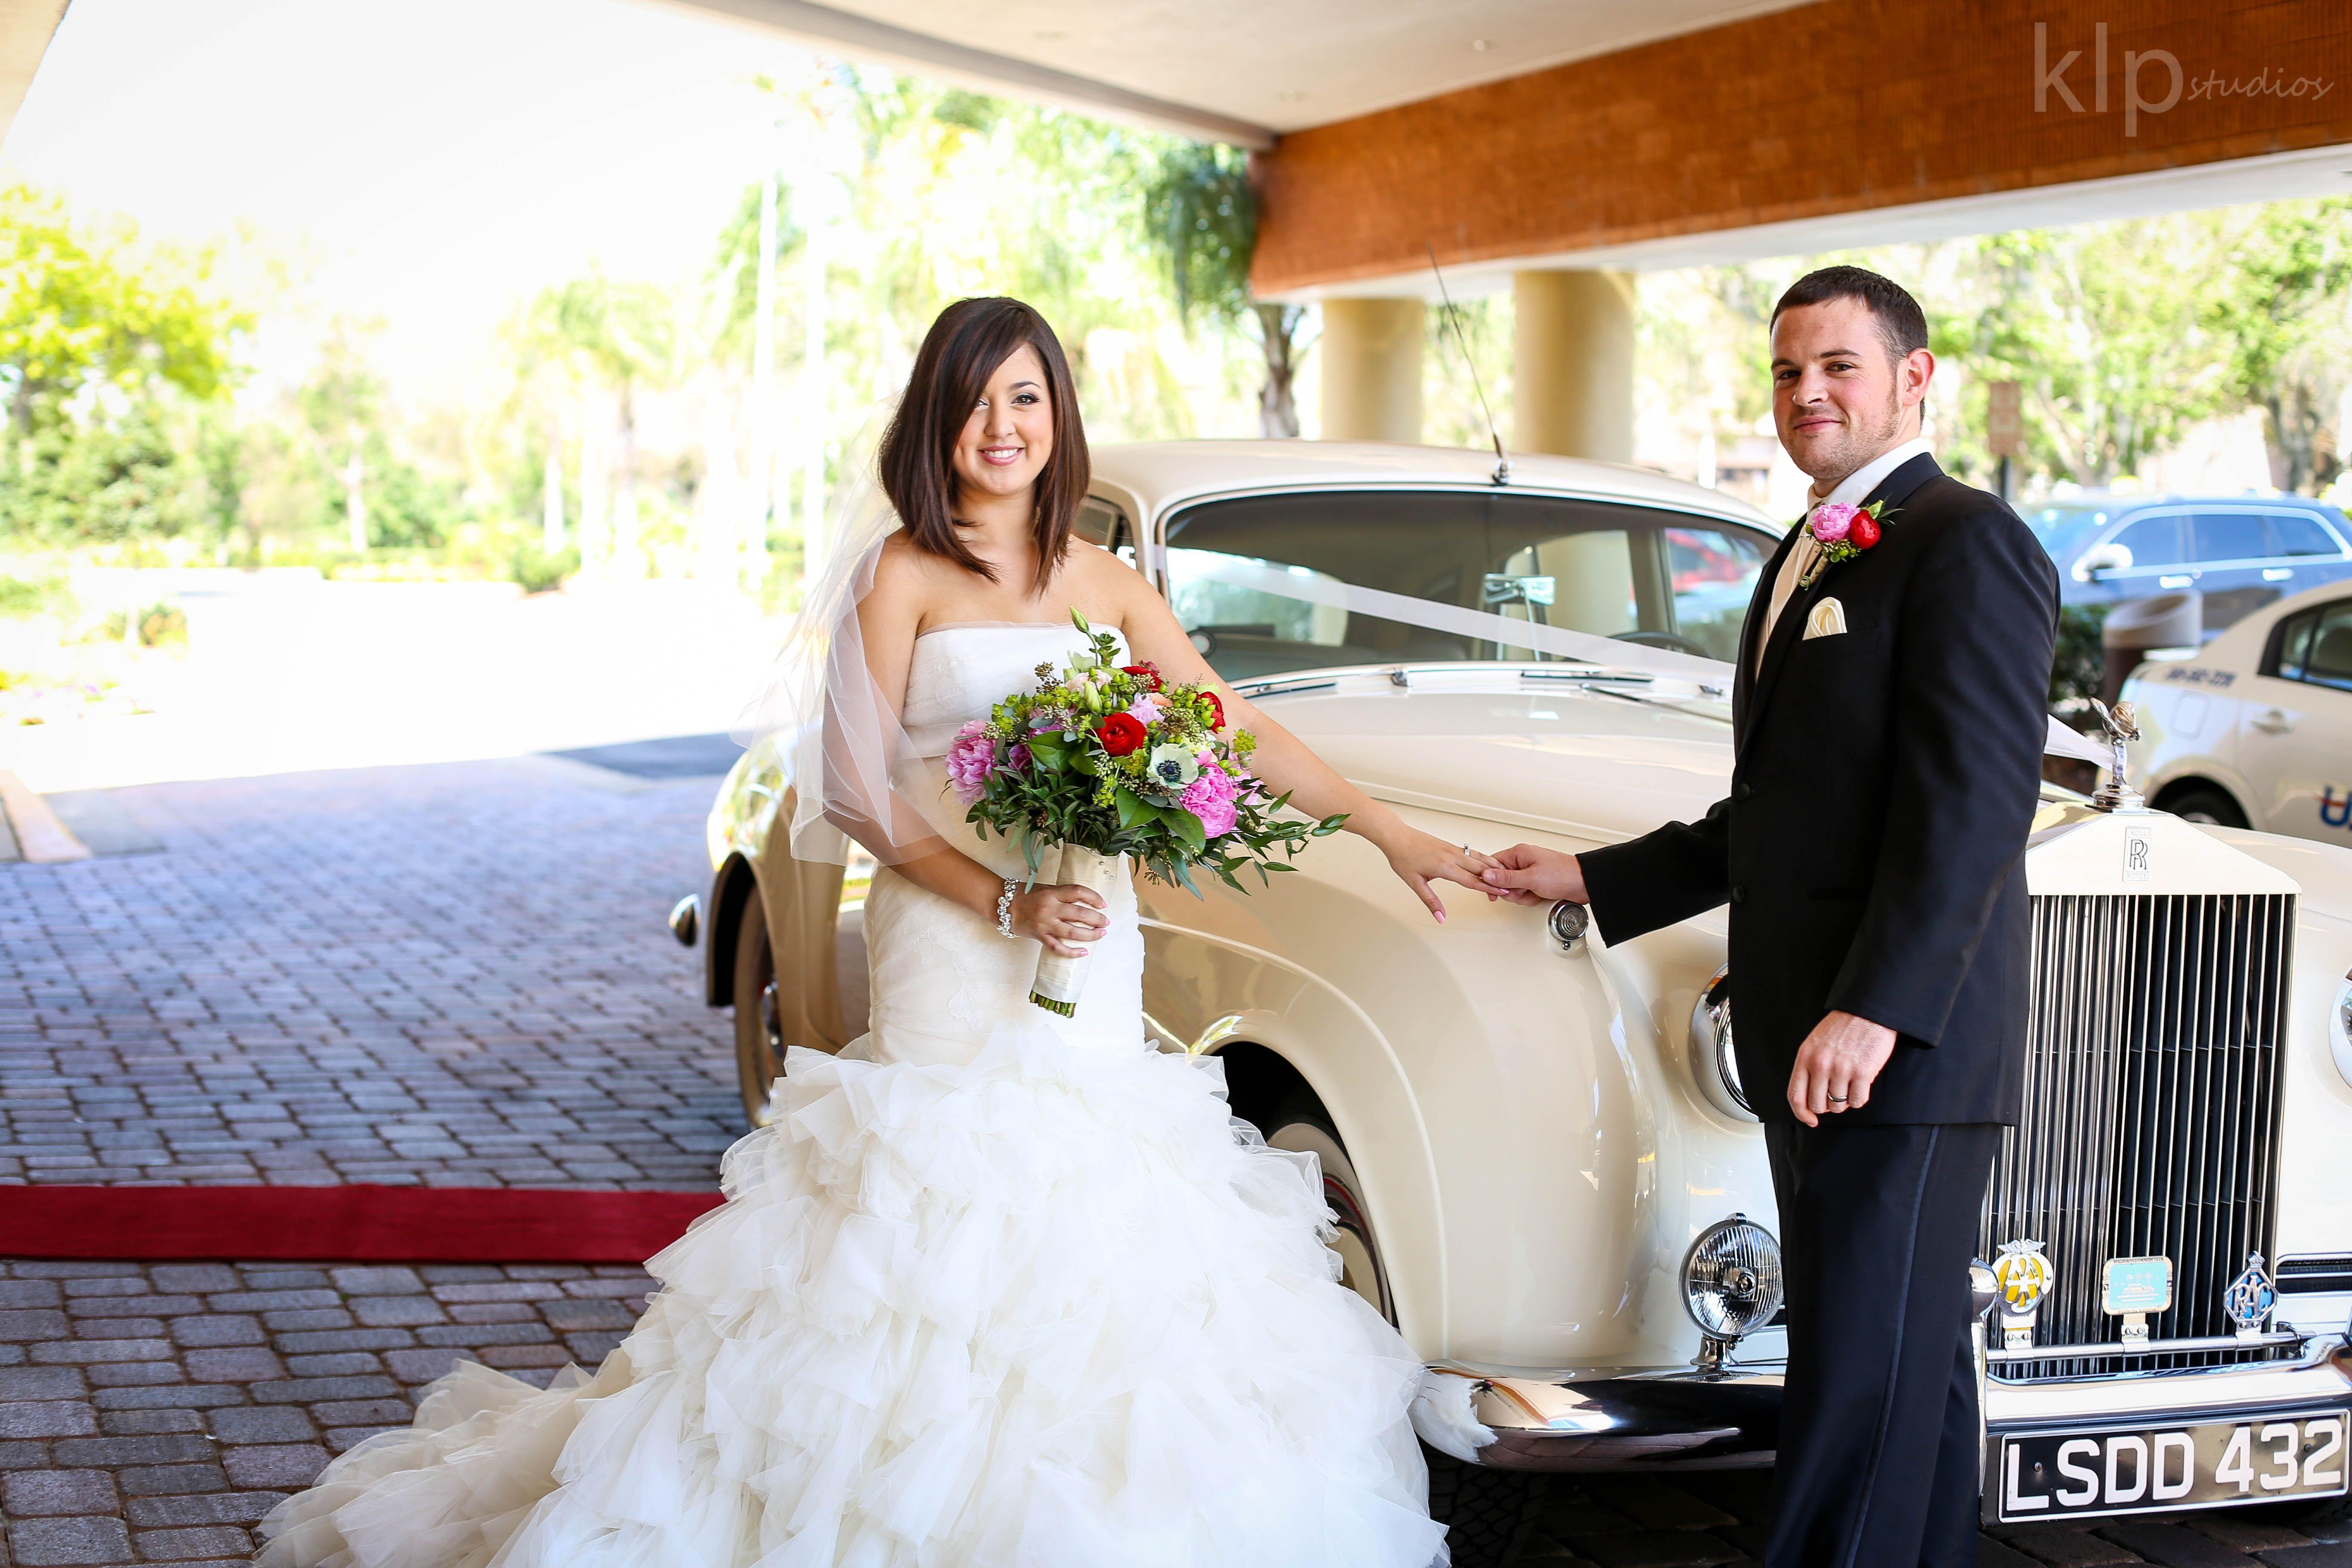 Catholic wedding dresses  Krista Lajara Photography  klpstudios  wedding